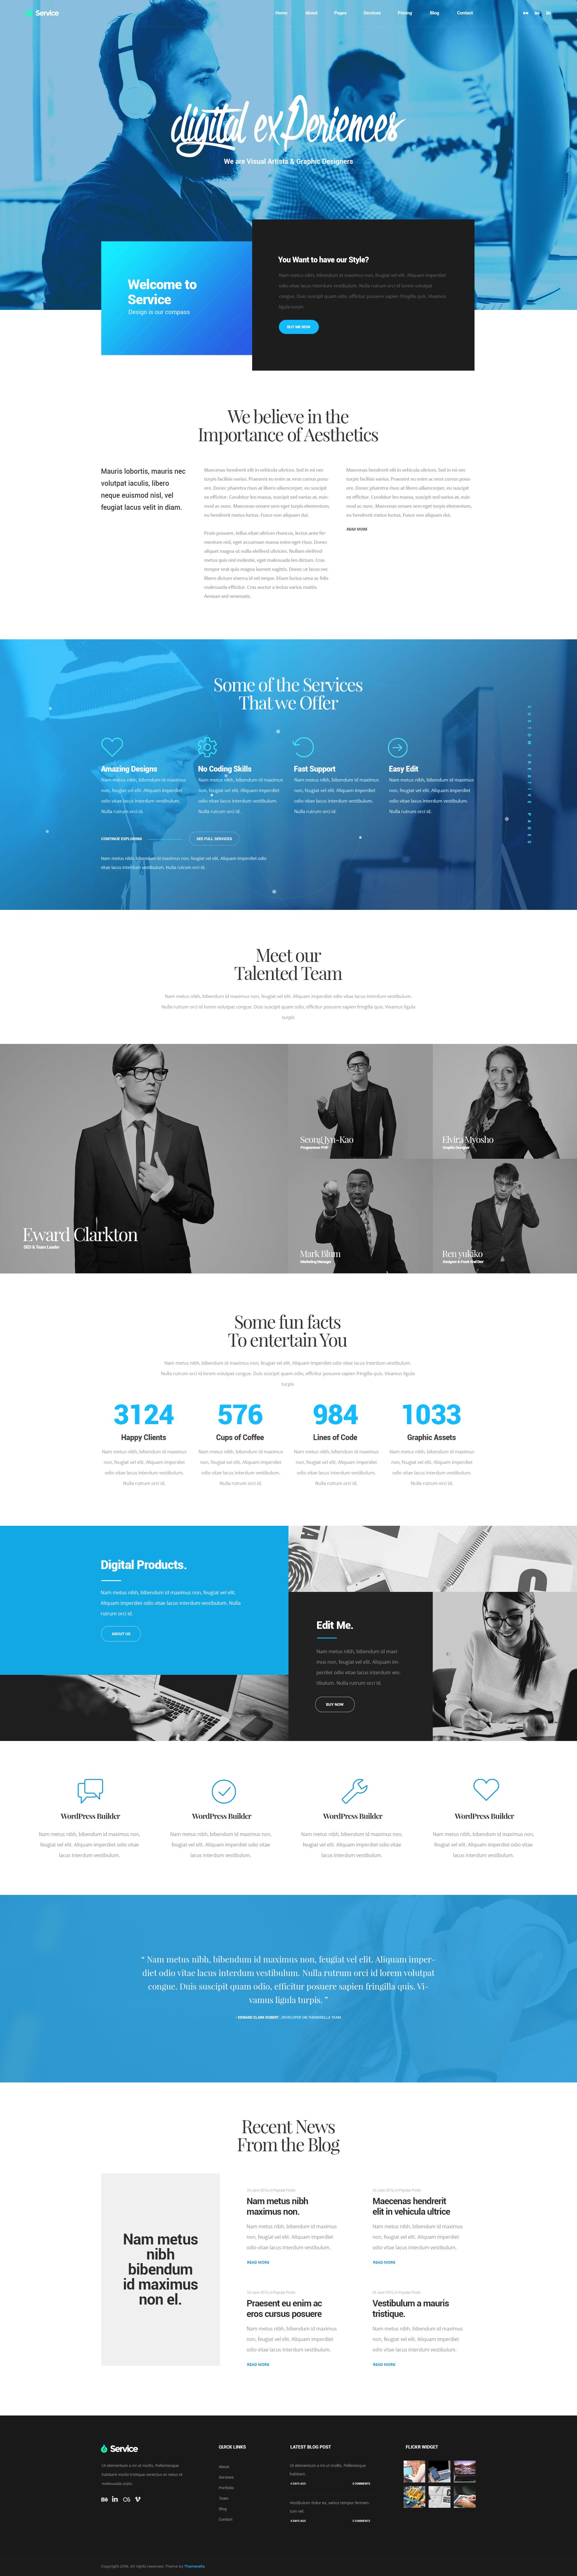 Services Modern Multipurpose Psd Template By Themerella Themeforest Web Layout Design Web Design Flat Web Design